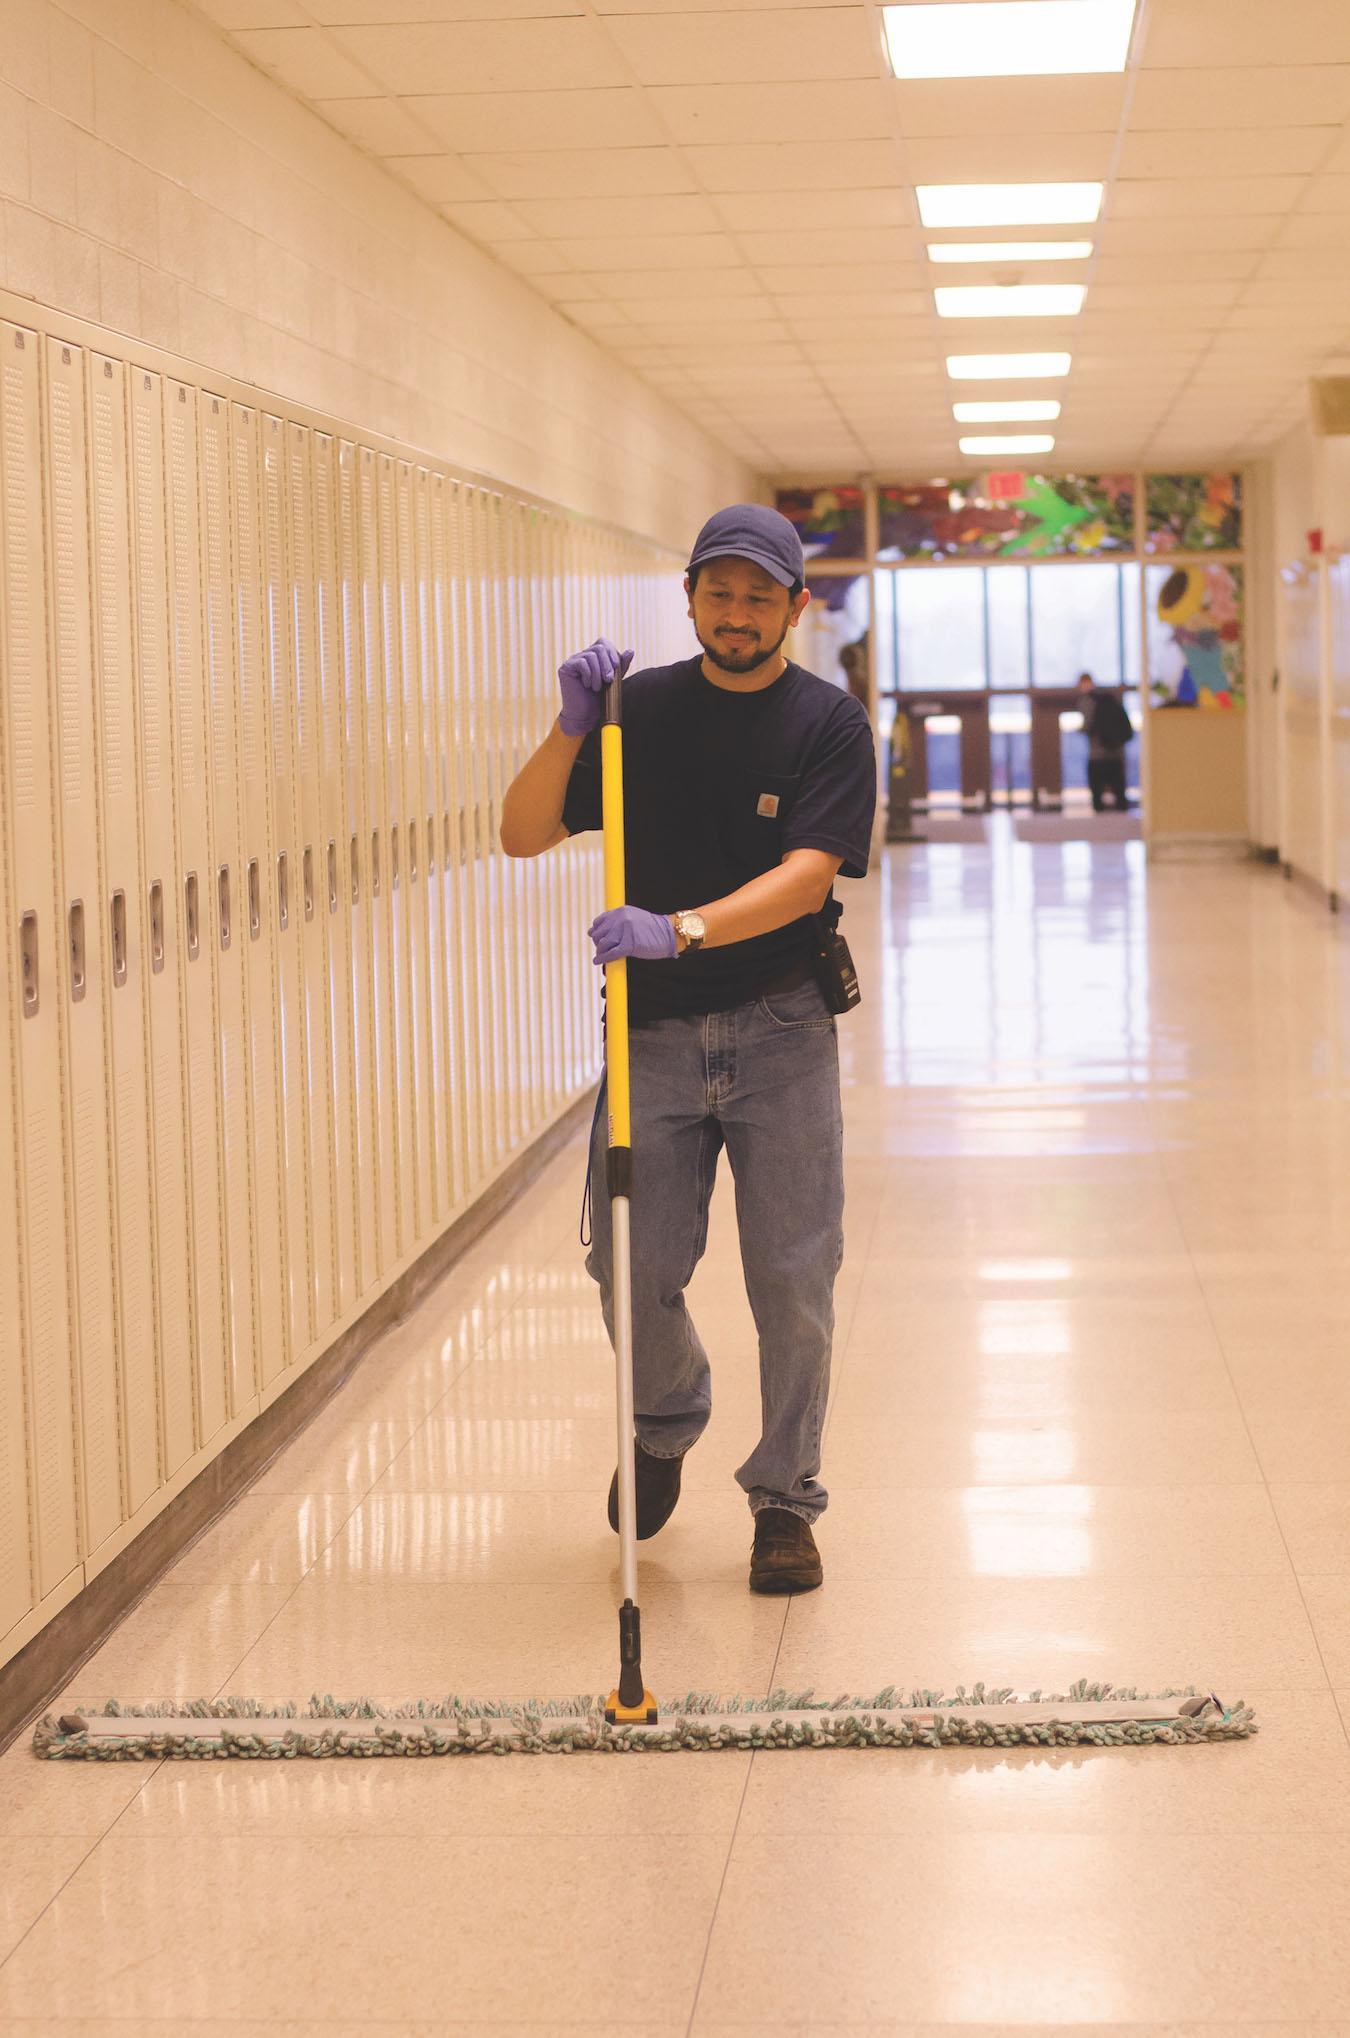 Carlos mopping the art hallway. Photo by Sarah Longmire